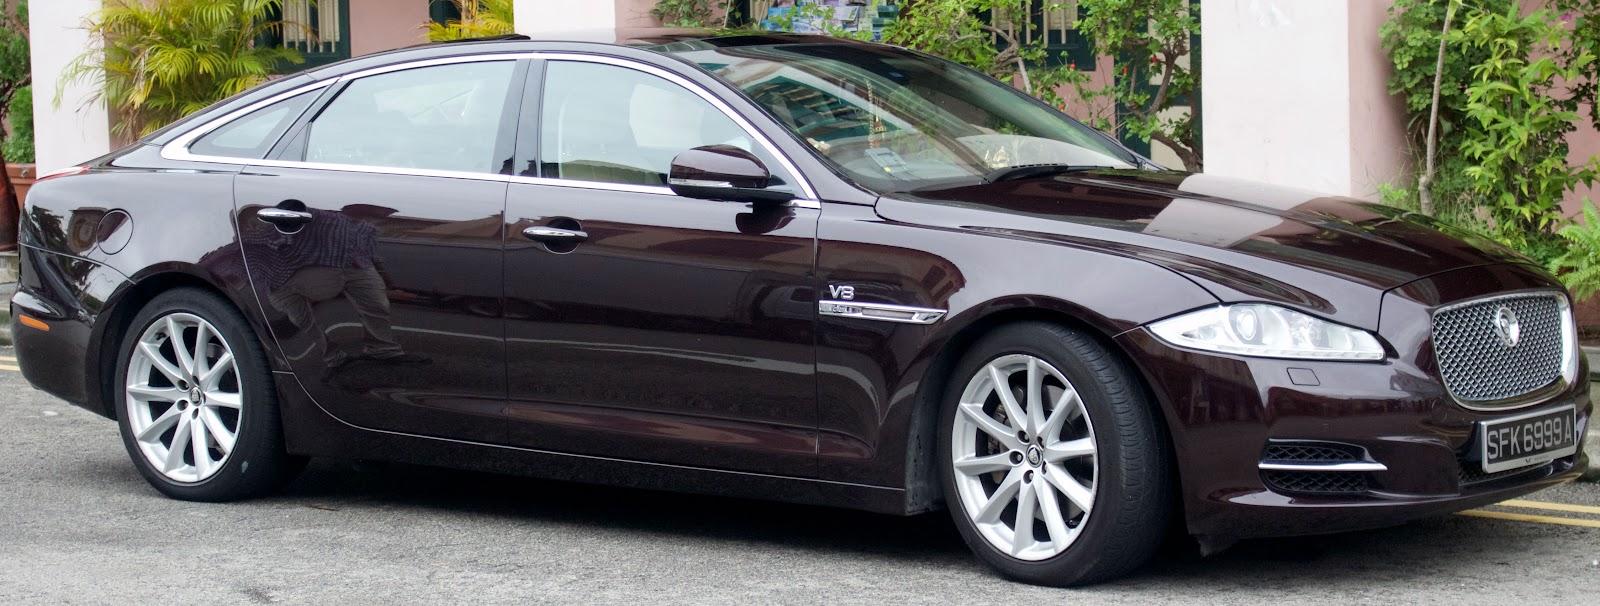 Photo of Jaguar XJ: 69% 5-year depreciation rate